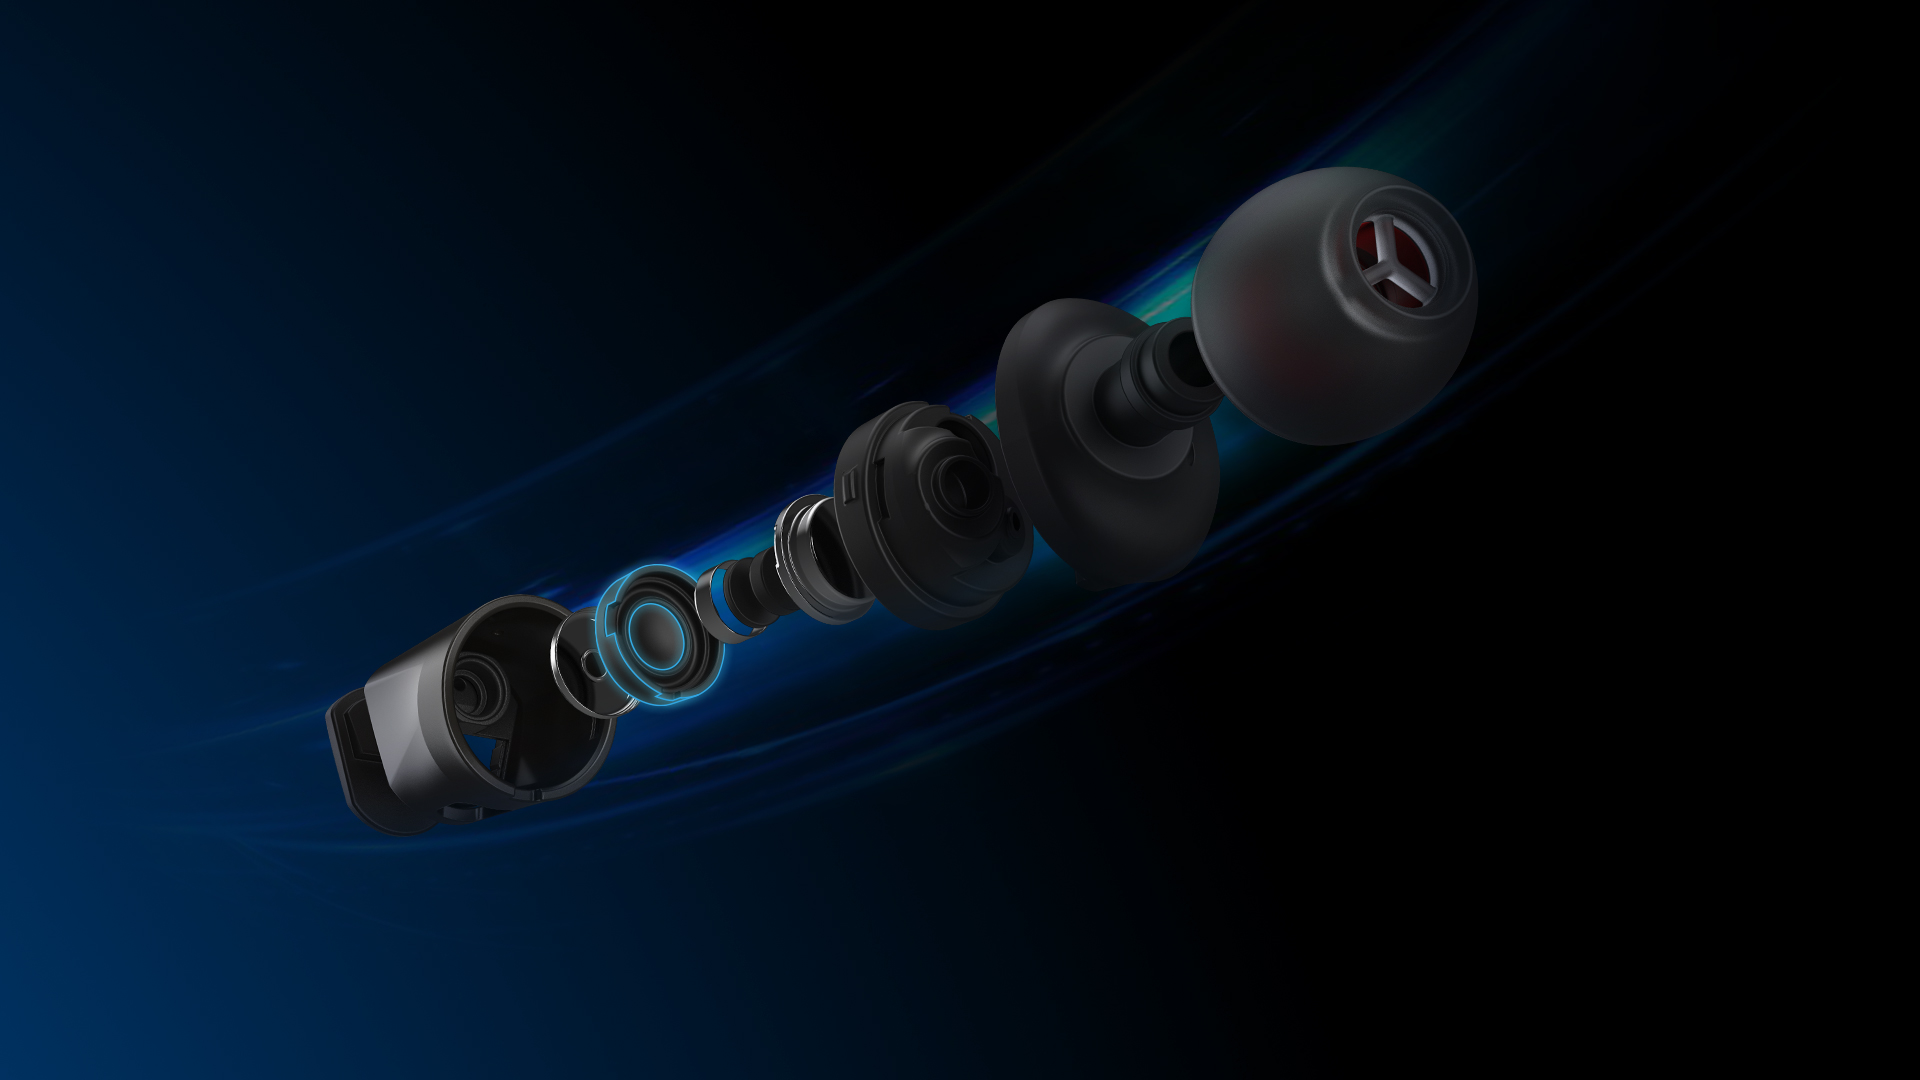 Liquid silicone rubber ASUS Essence drivers